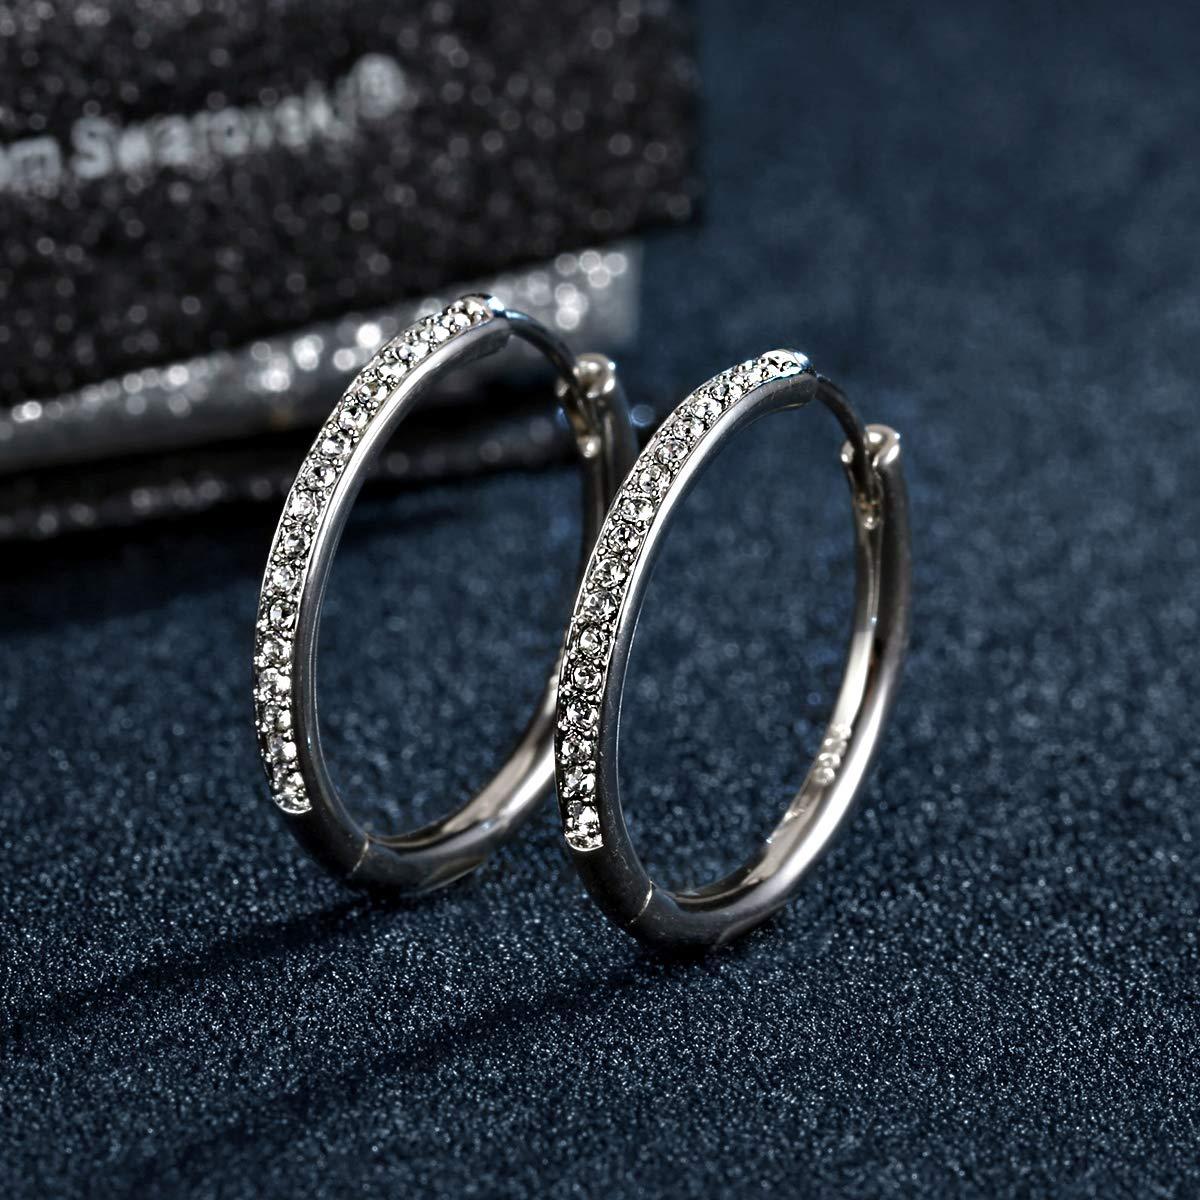 b99e63b6e YOURDORA Women Plated 18ct White Gold Swarovski Crystals Large Hoop Earrings  Sleeper Hinged 25mm: Amazon.co.uk: Jewellery